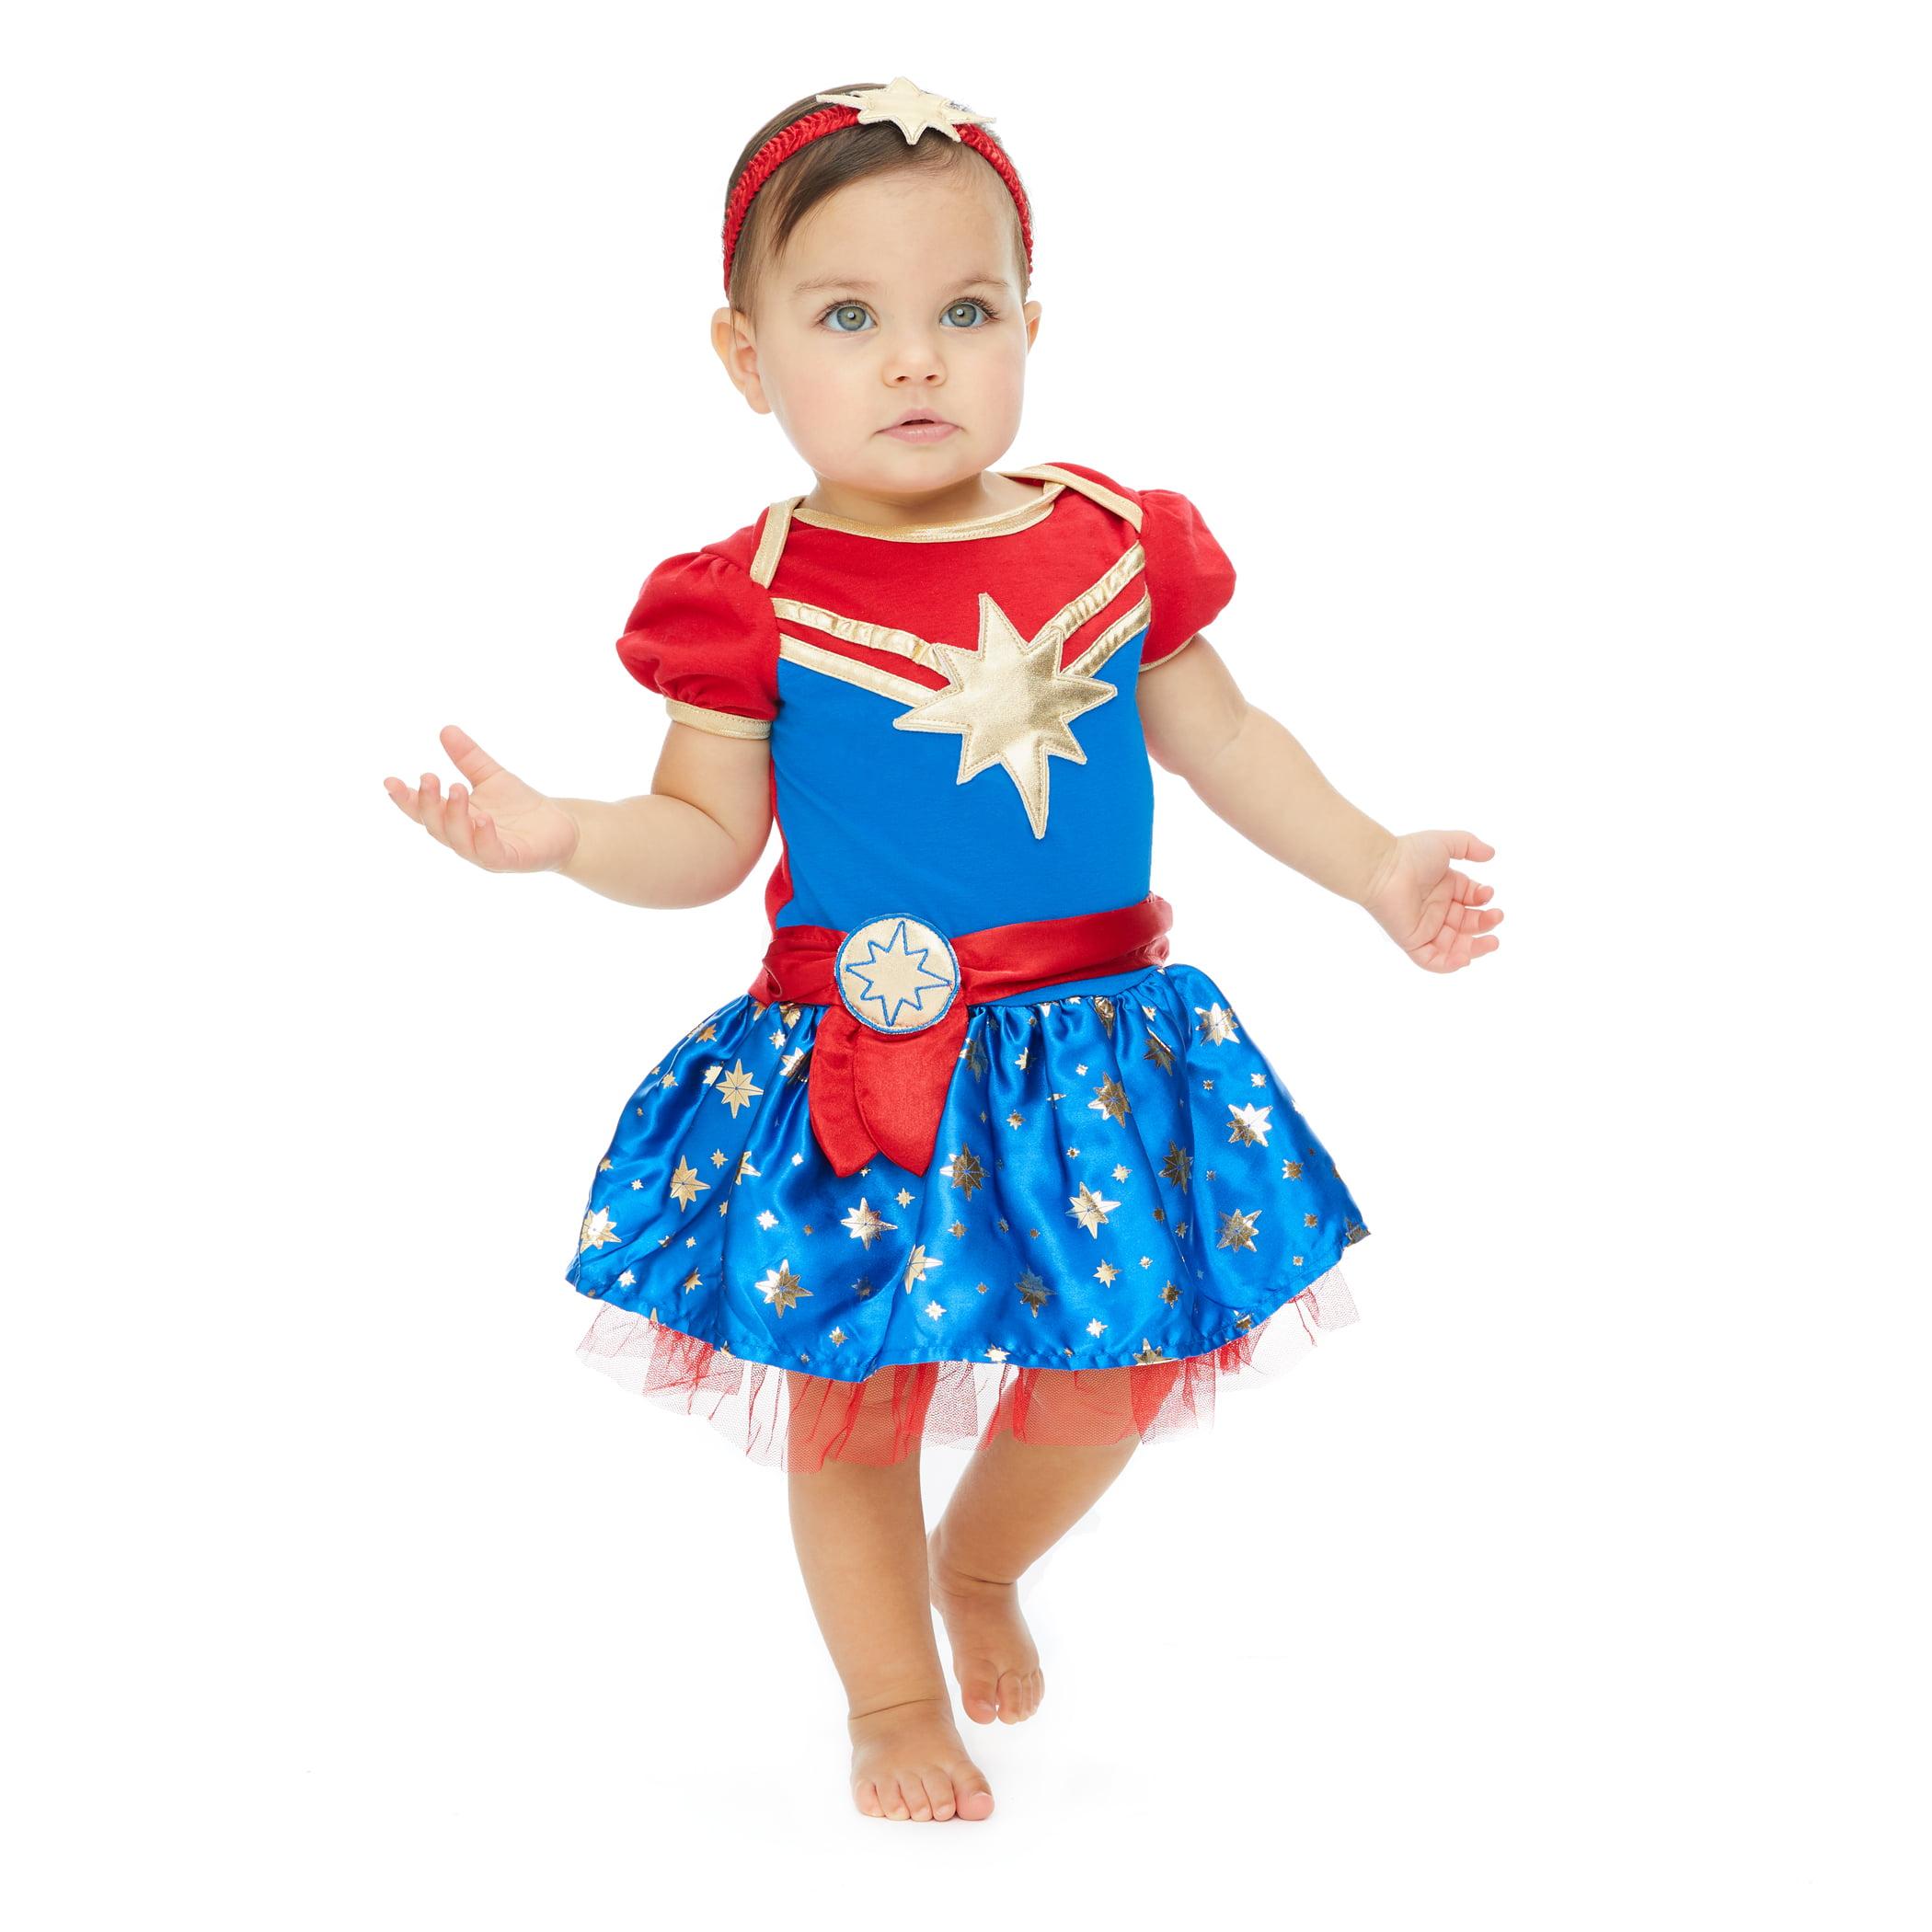 Marvel Captain Marvel Baby Girls Costume Short Sleeve Dress Superhero 6 9 Months Walmart Com Walmart Com Carol danvers full set includes: marvel captain marvel baby girls costume short sleeve dress superhero 6 9 months walmart com